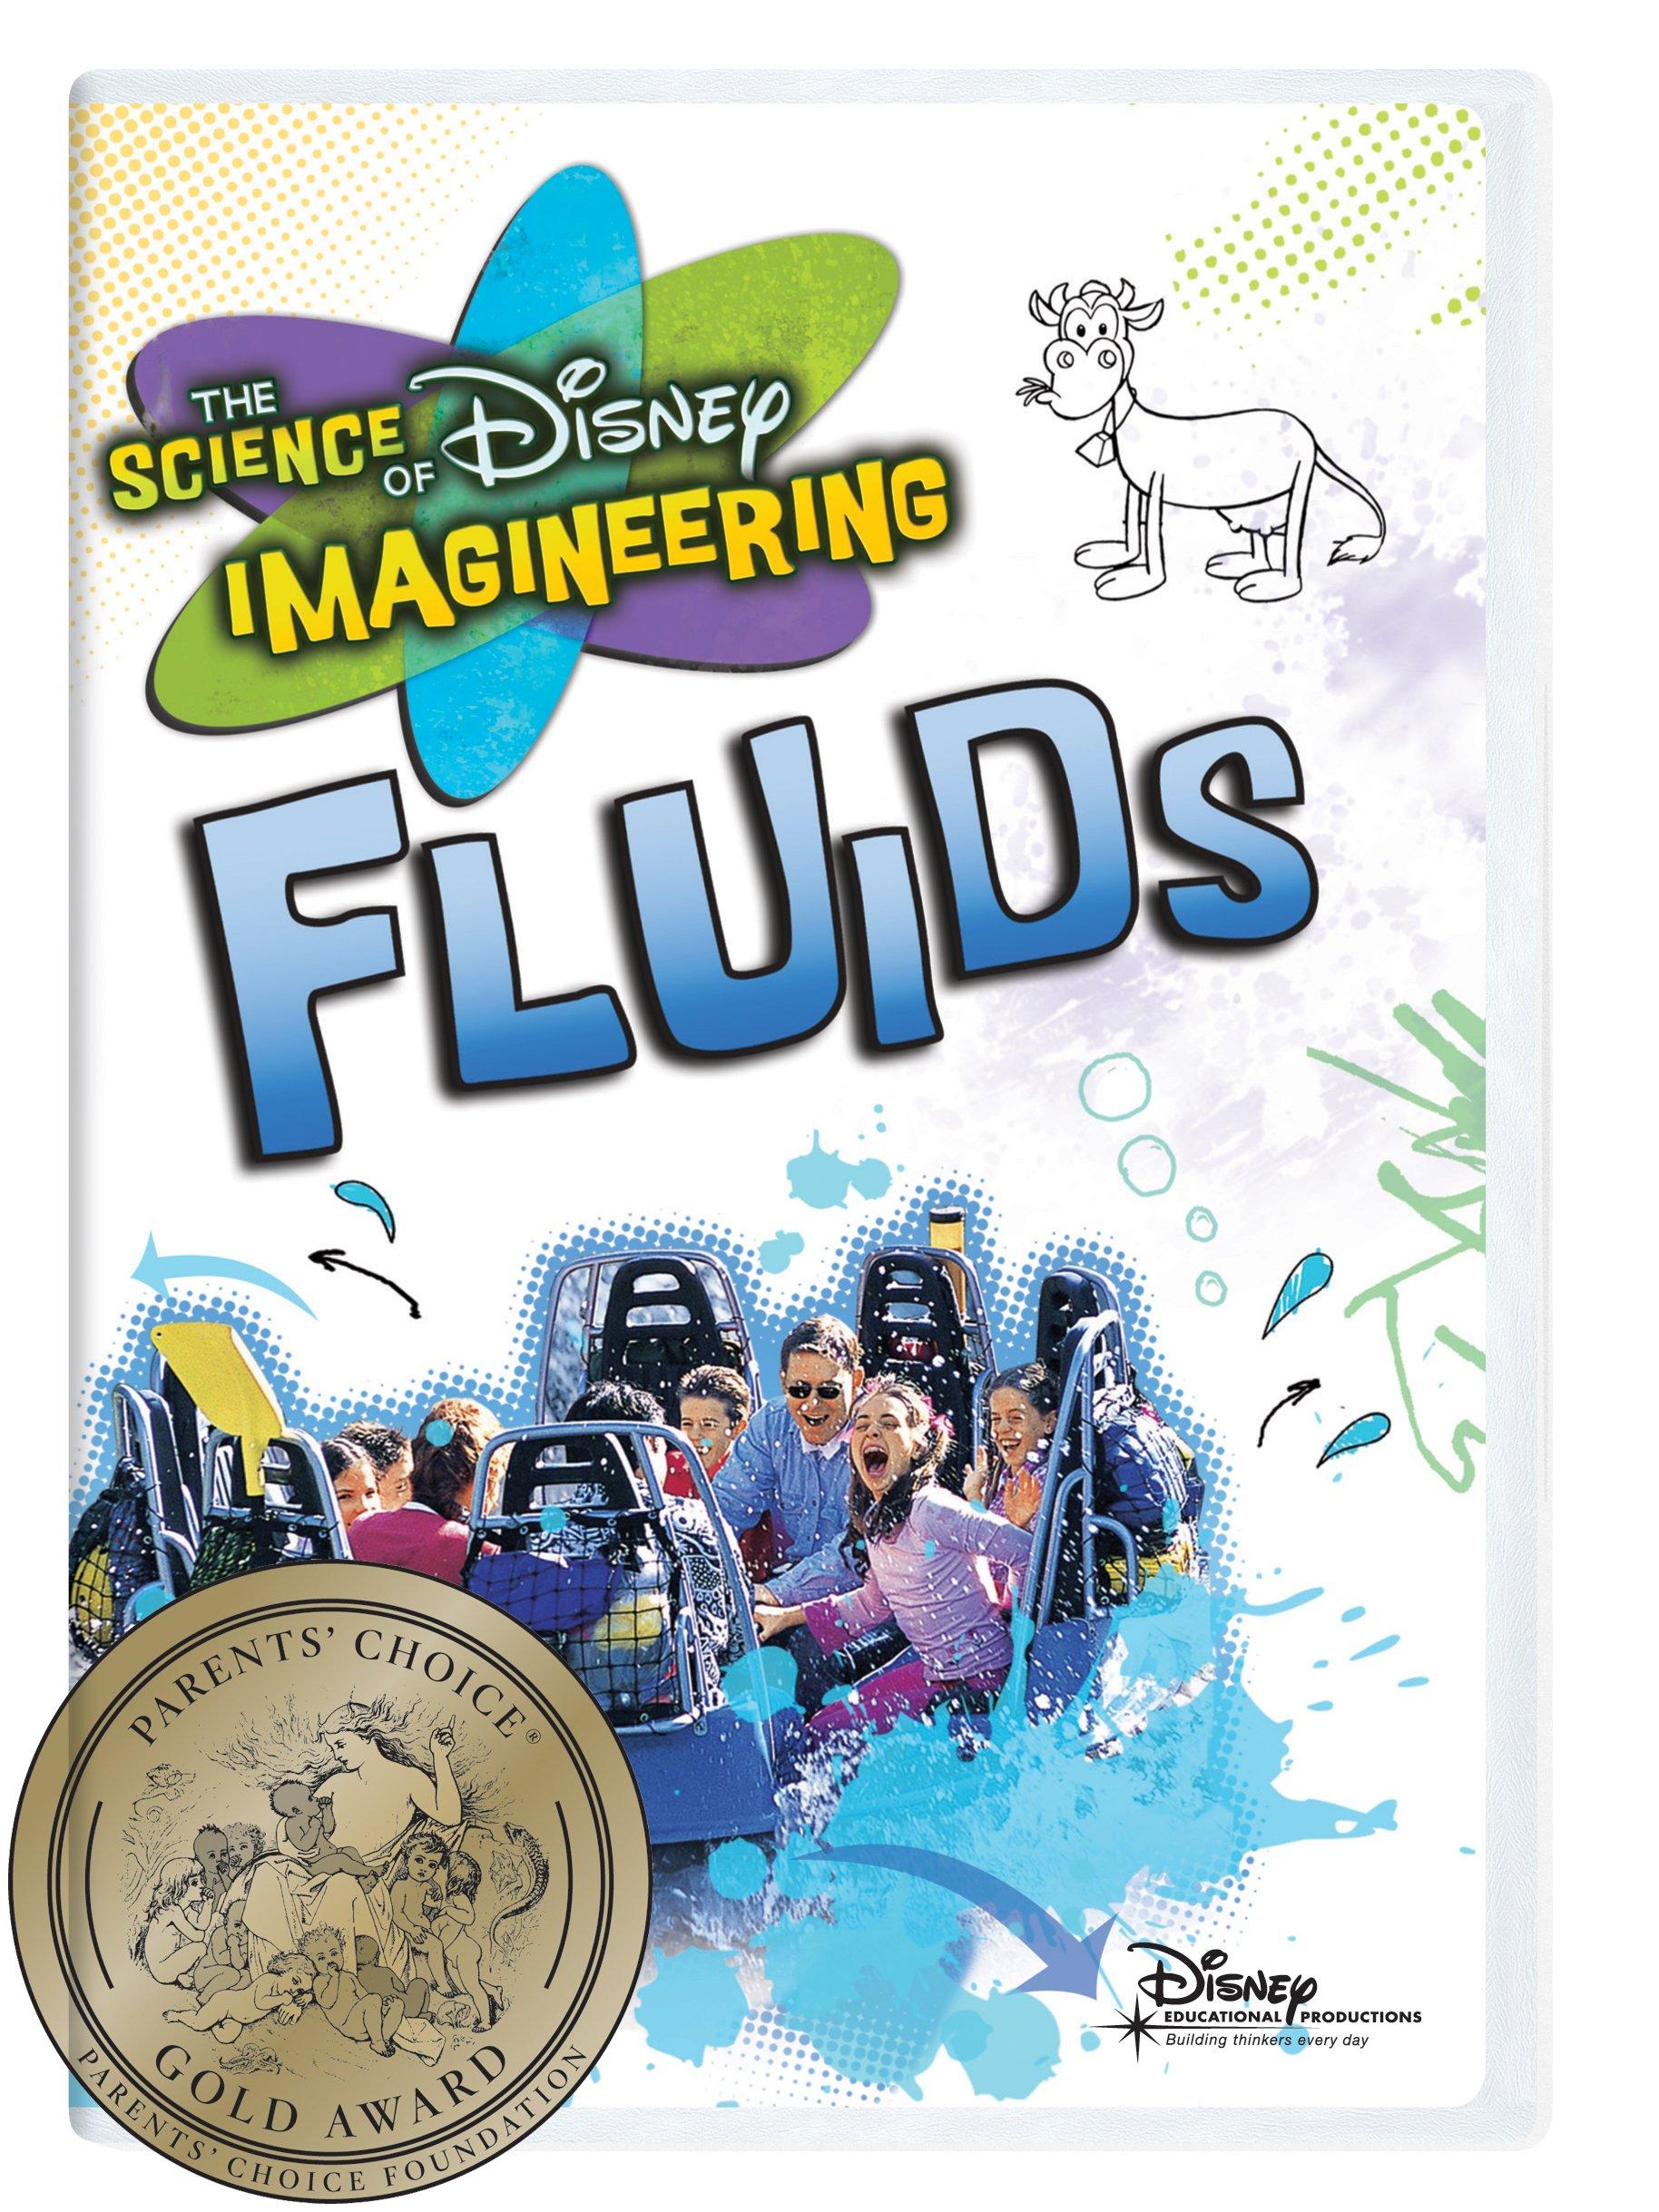 The Science of Disney Imagineering: Fluids Classroom Edition [Interactive DVD]